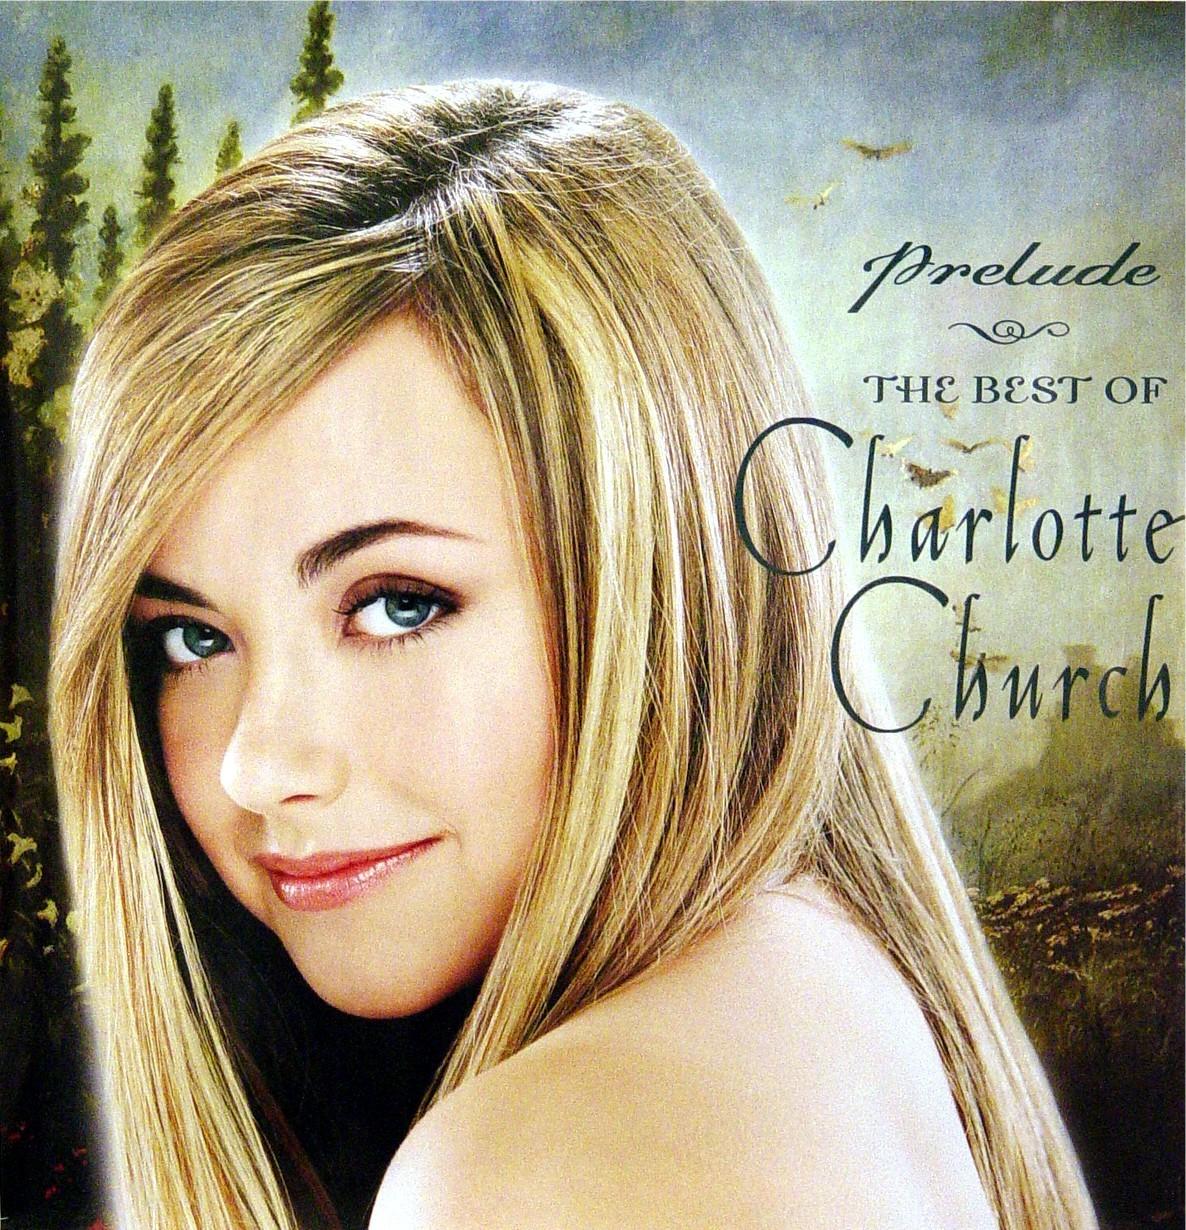 Charlotte church virgin holidays lyrics